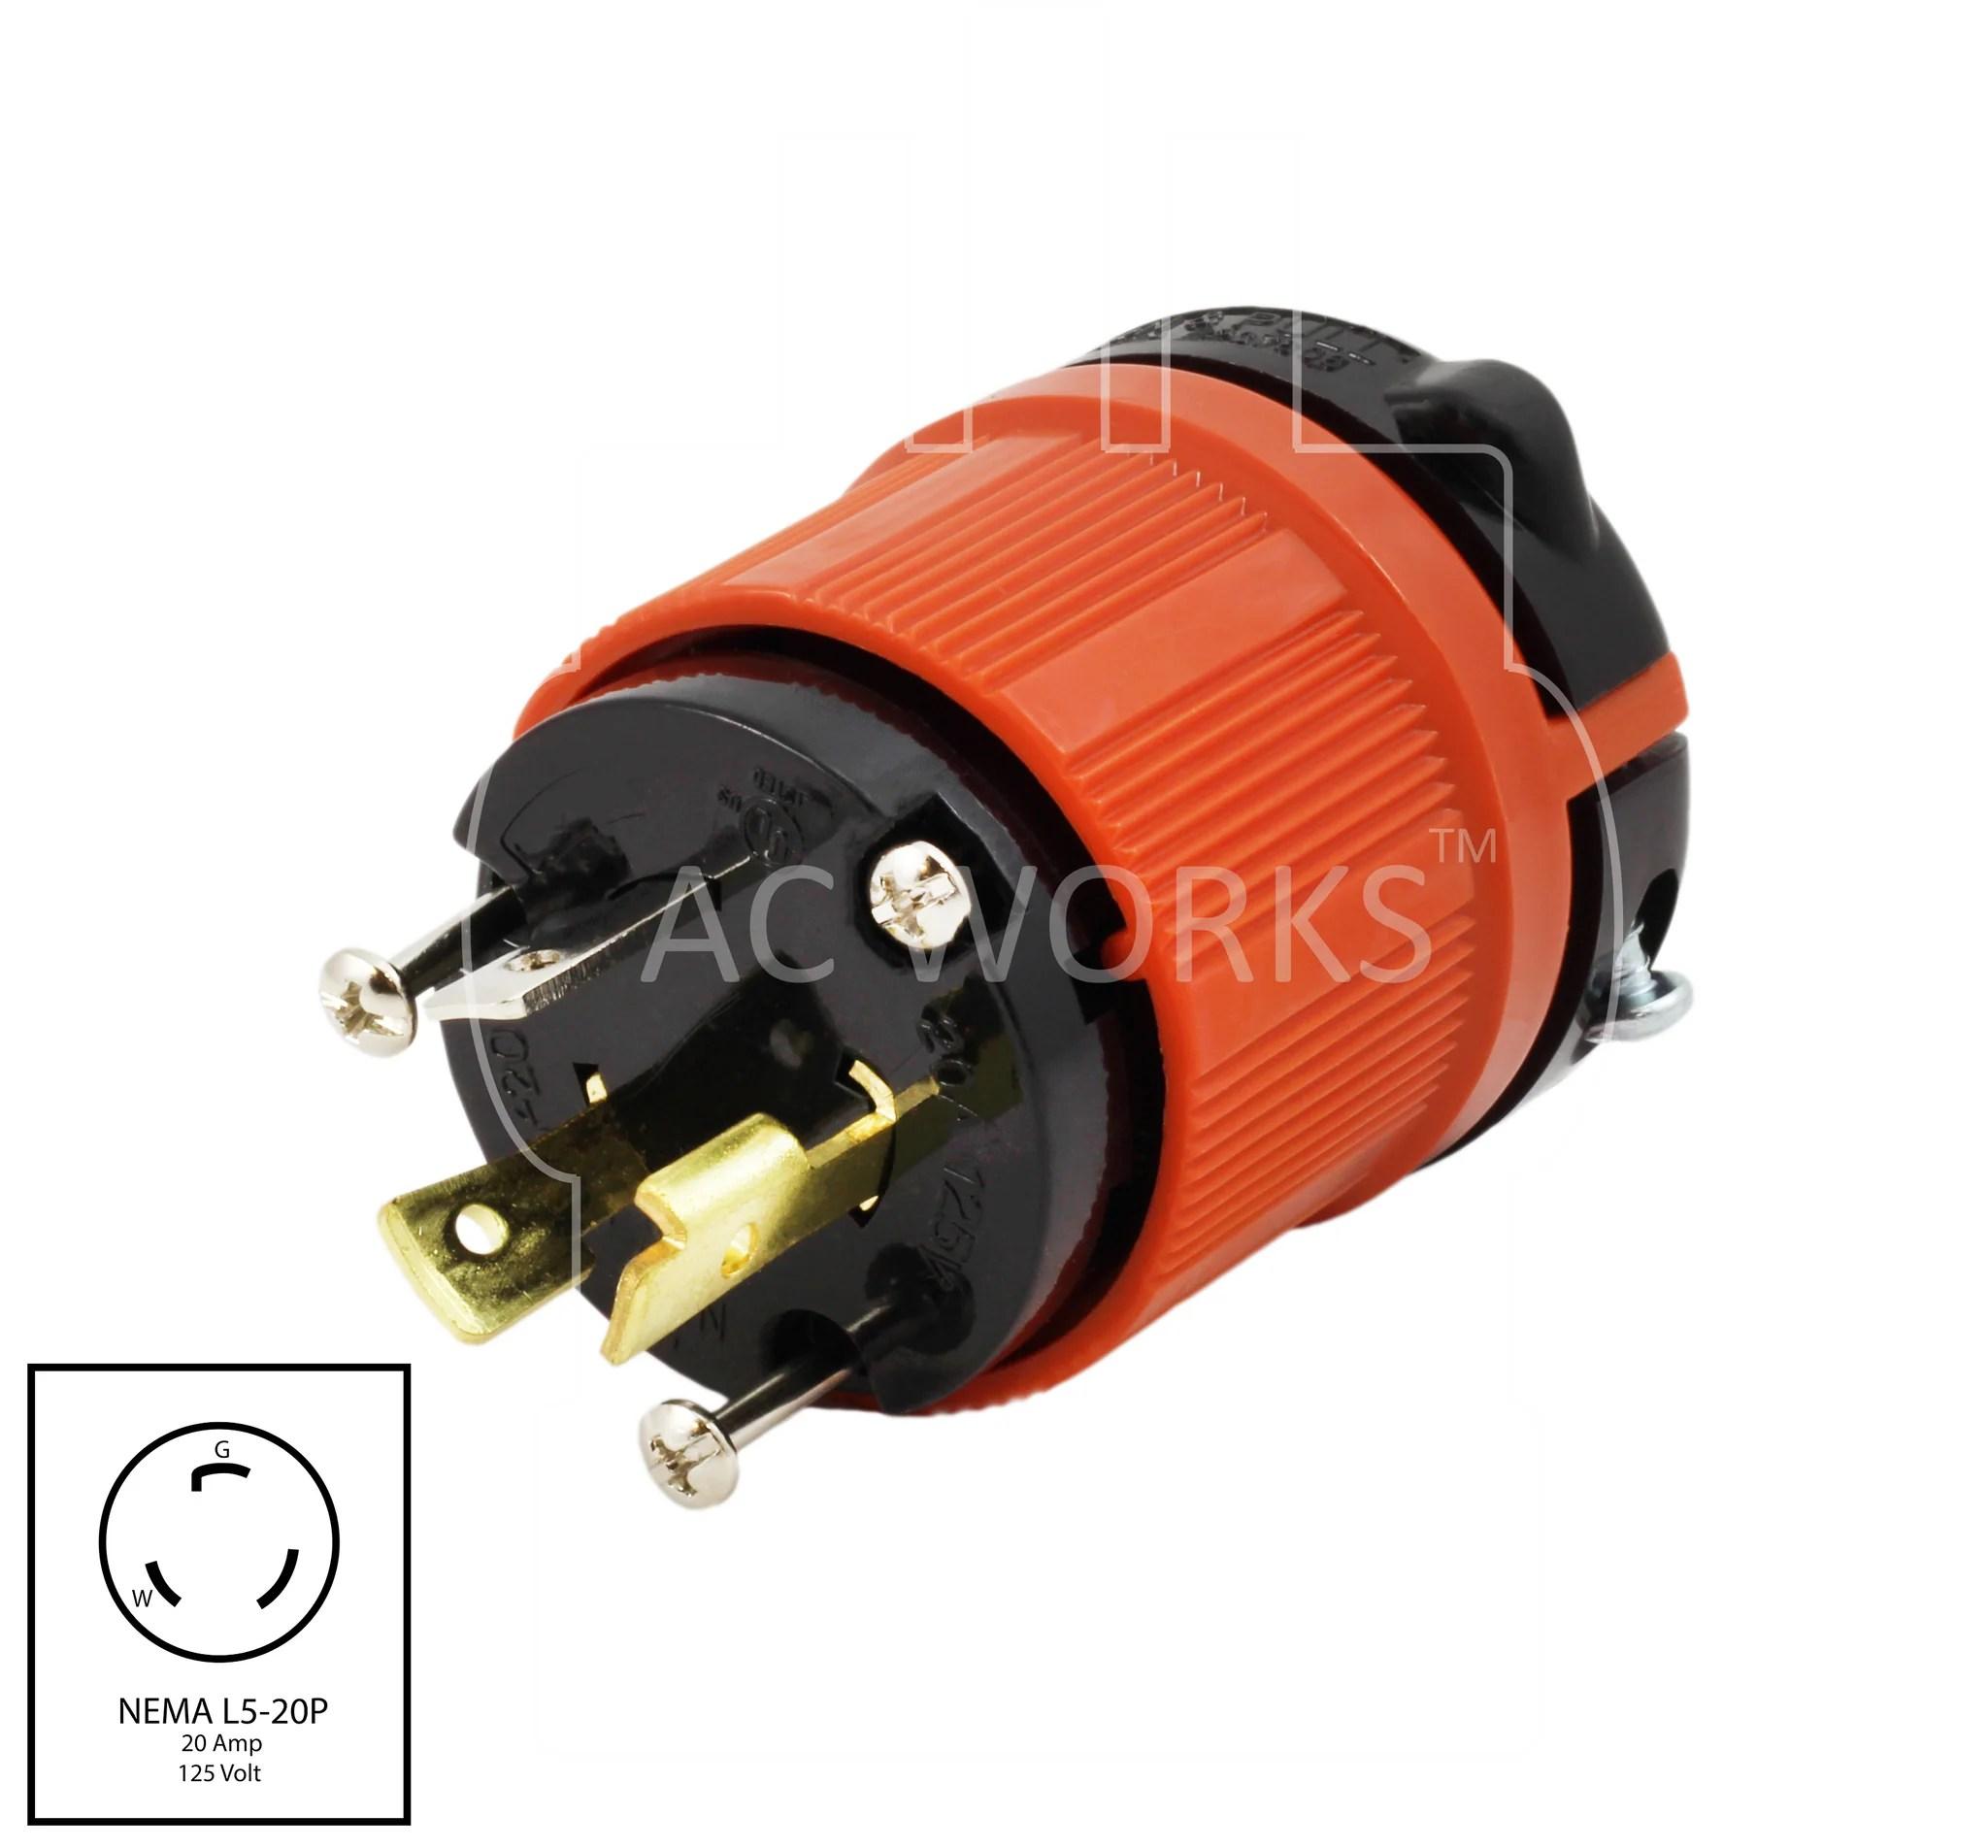 medium resolution of nema l5 20p 20amp 125volt 3 prong locking assembly male plug ac 110v plug wiring diagram